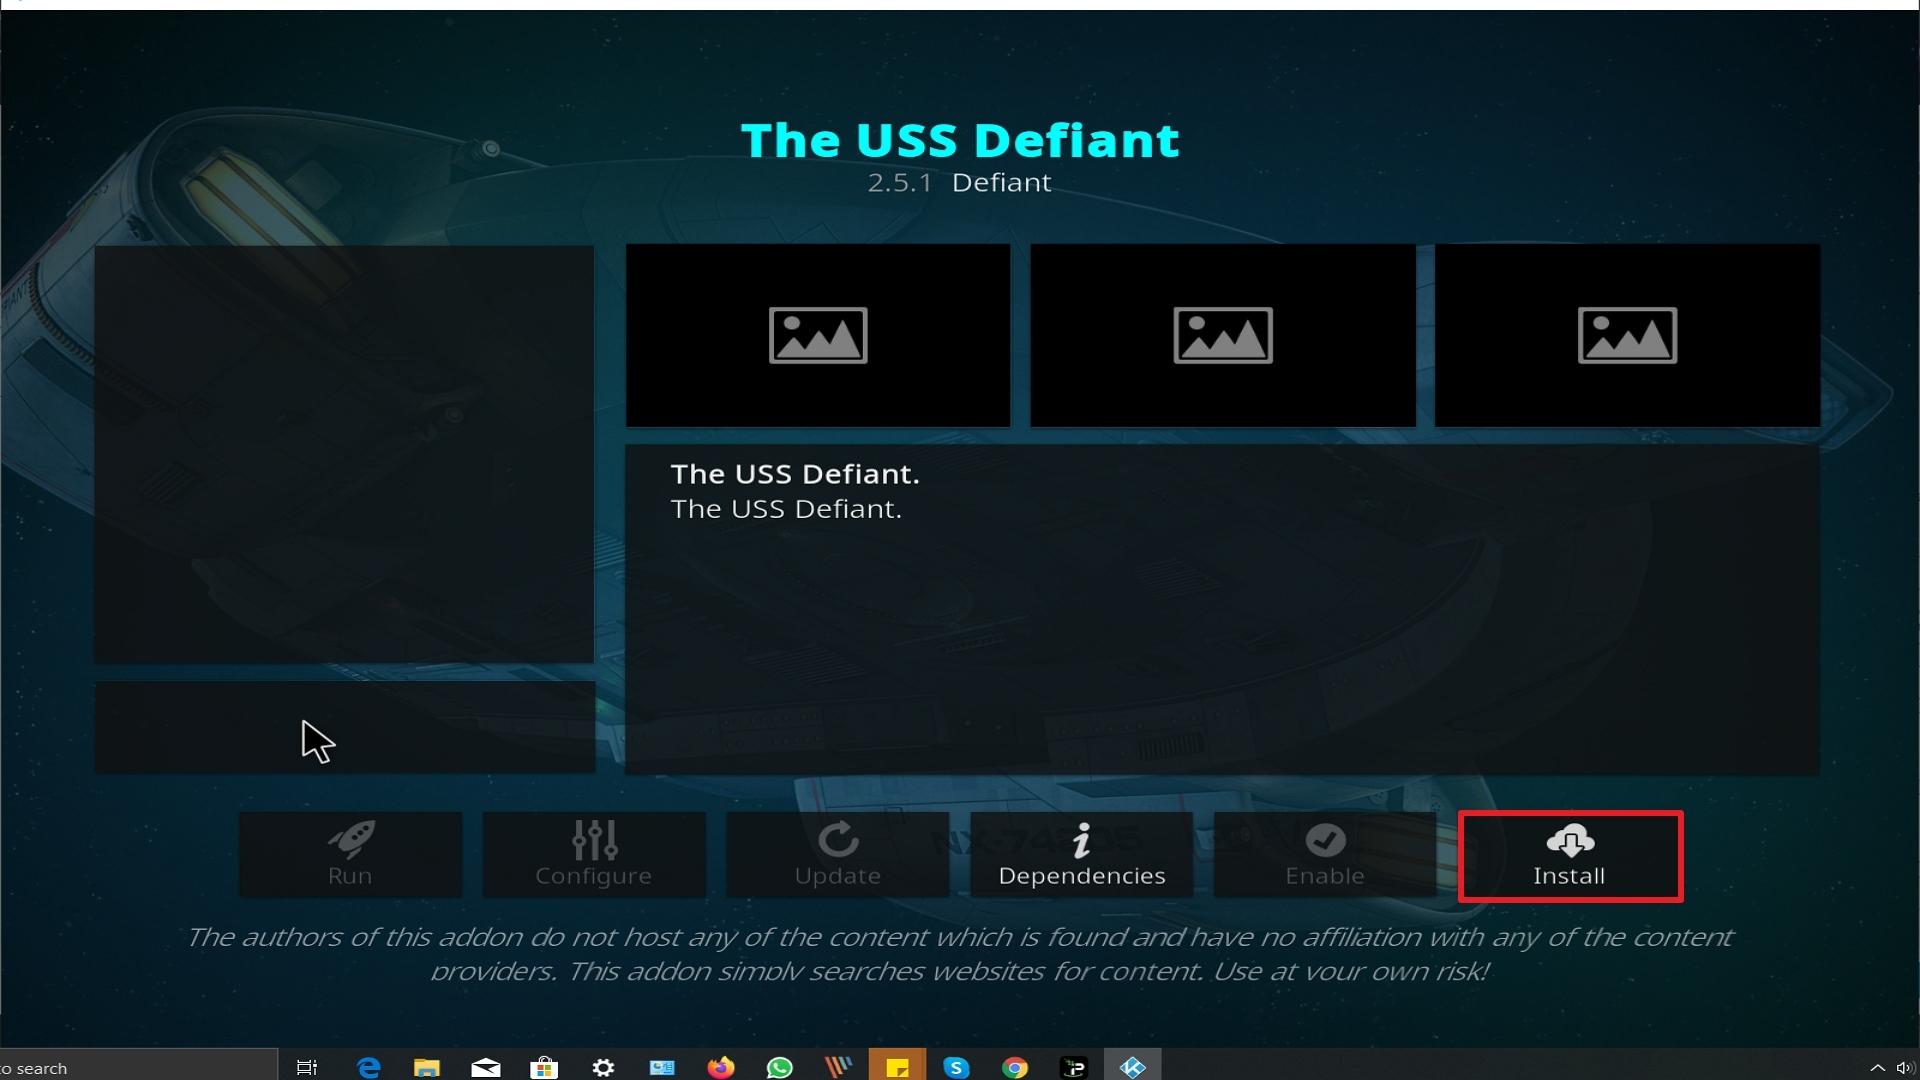 Step 23 Installing The Uss Defiant addon on Kodi